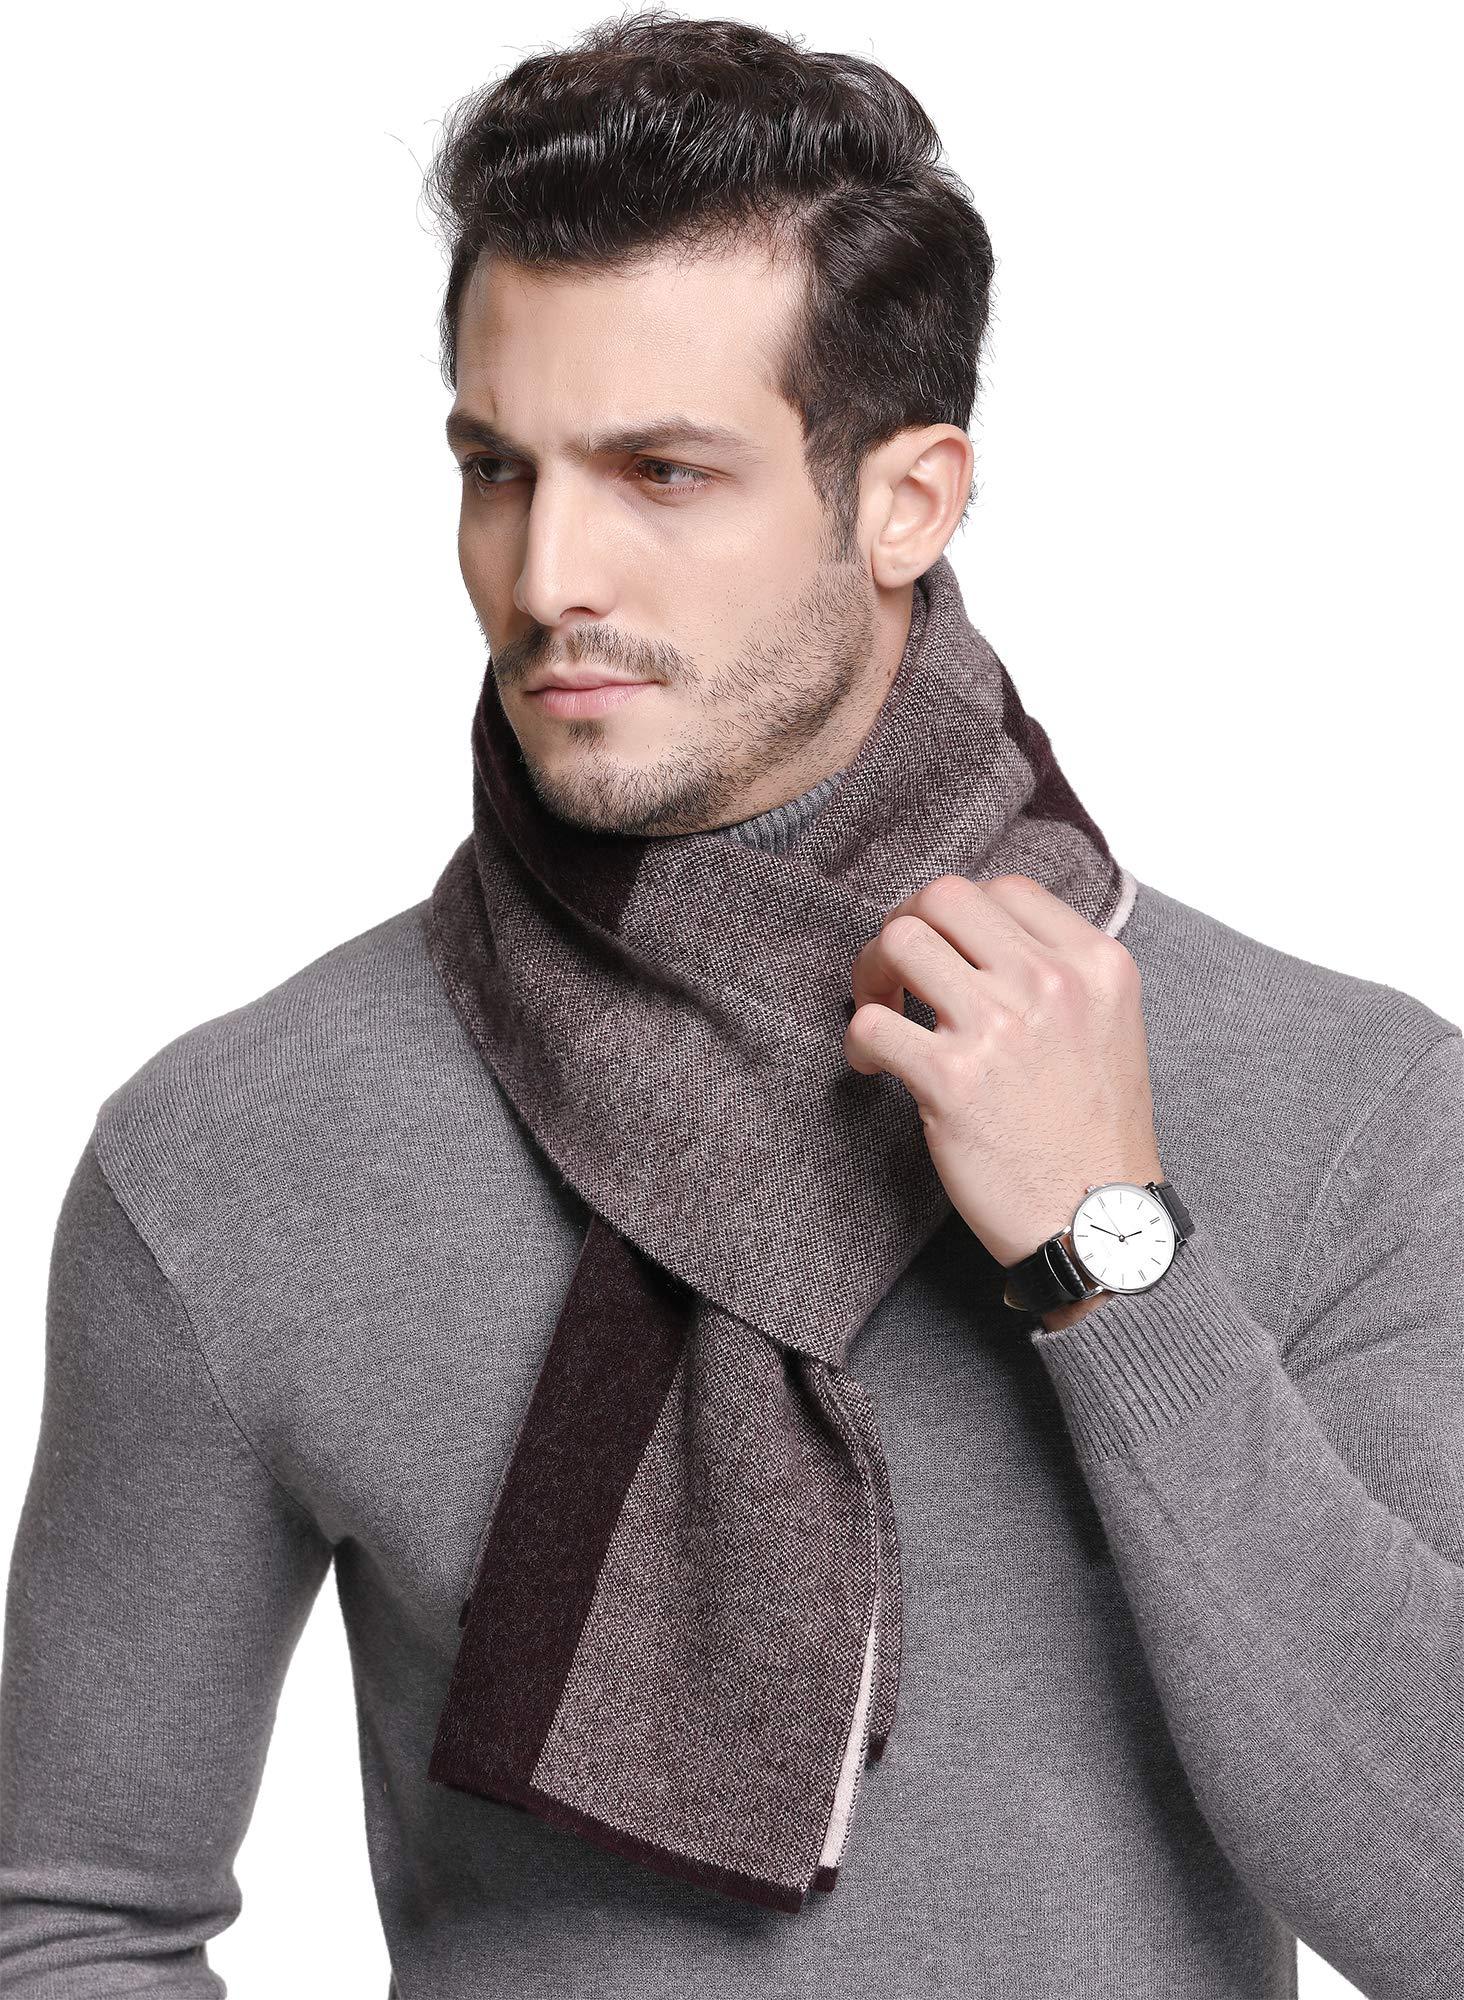 RIONA Men's 100% Australian Soft Merino Wool Knitted Plaid Warm Scarf with Gift Box (9005_Pruple)